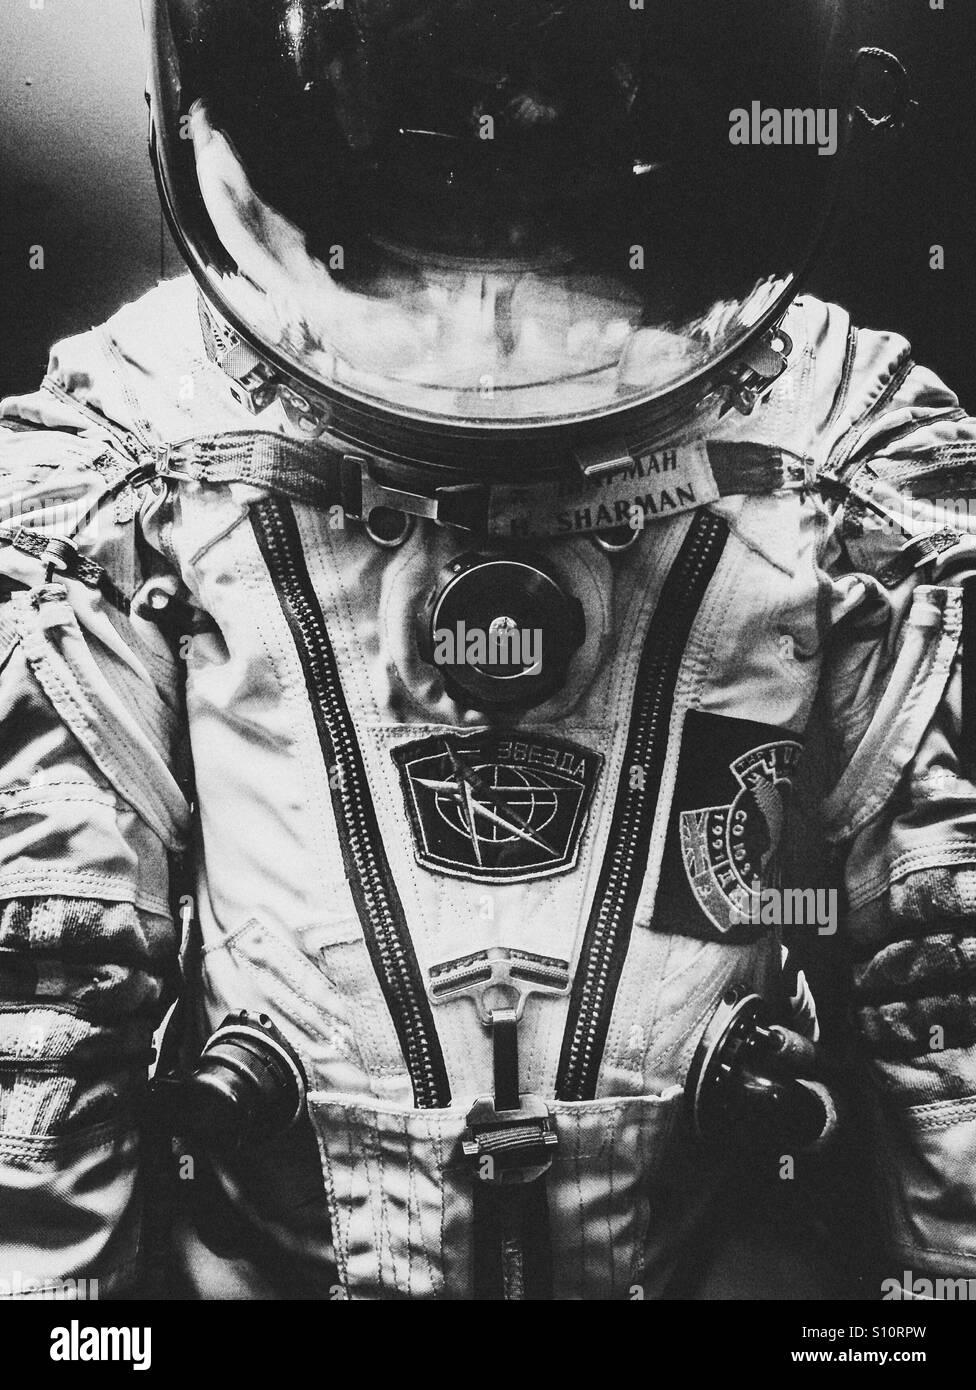 Spacesuit - Stock Image